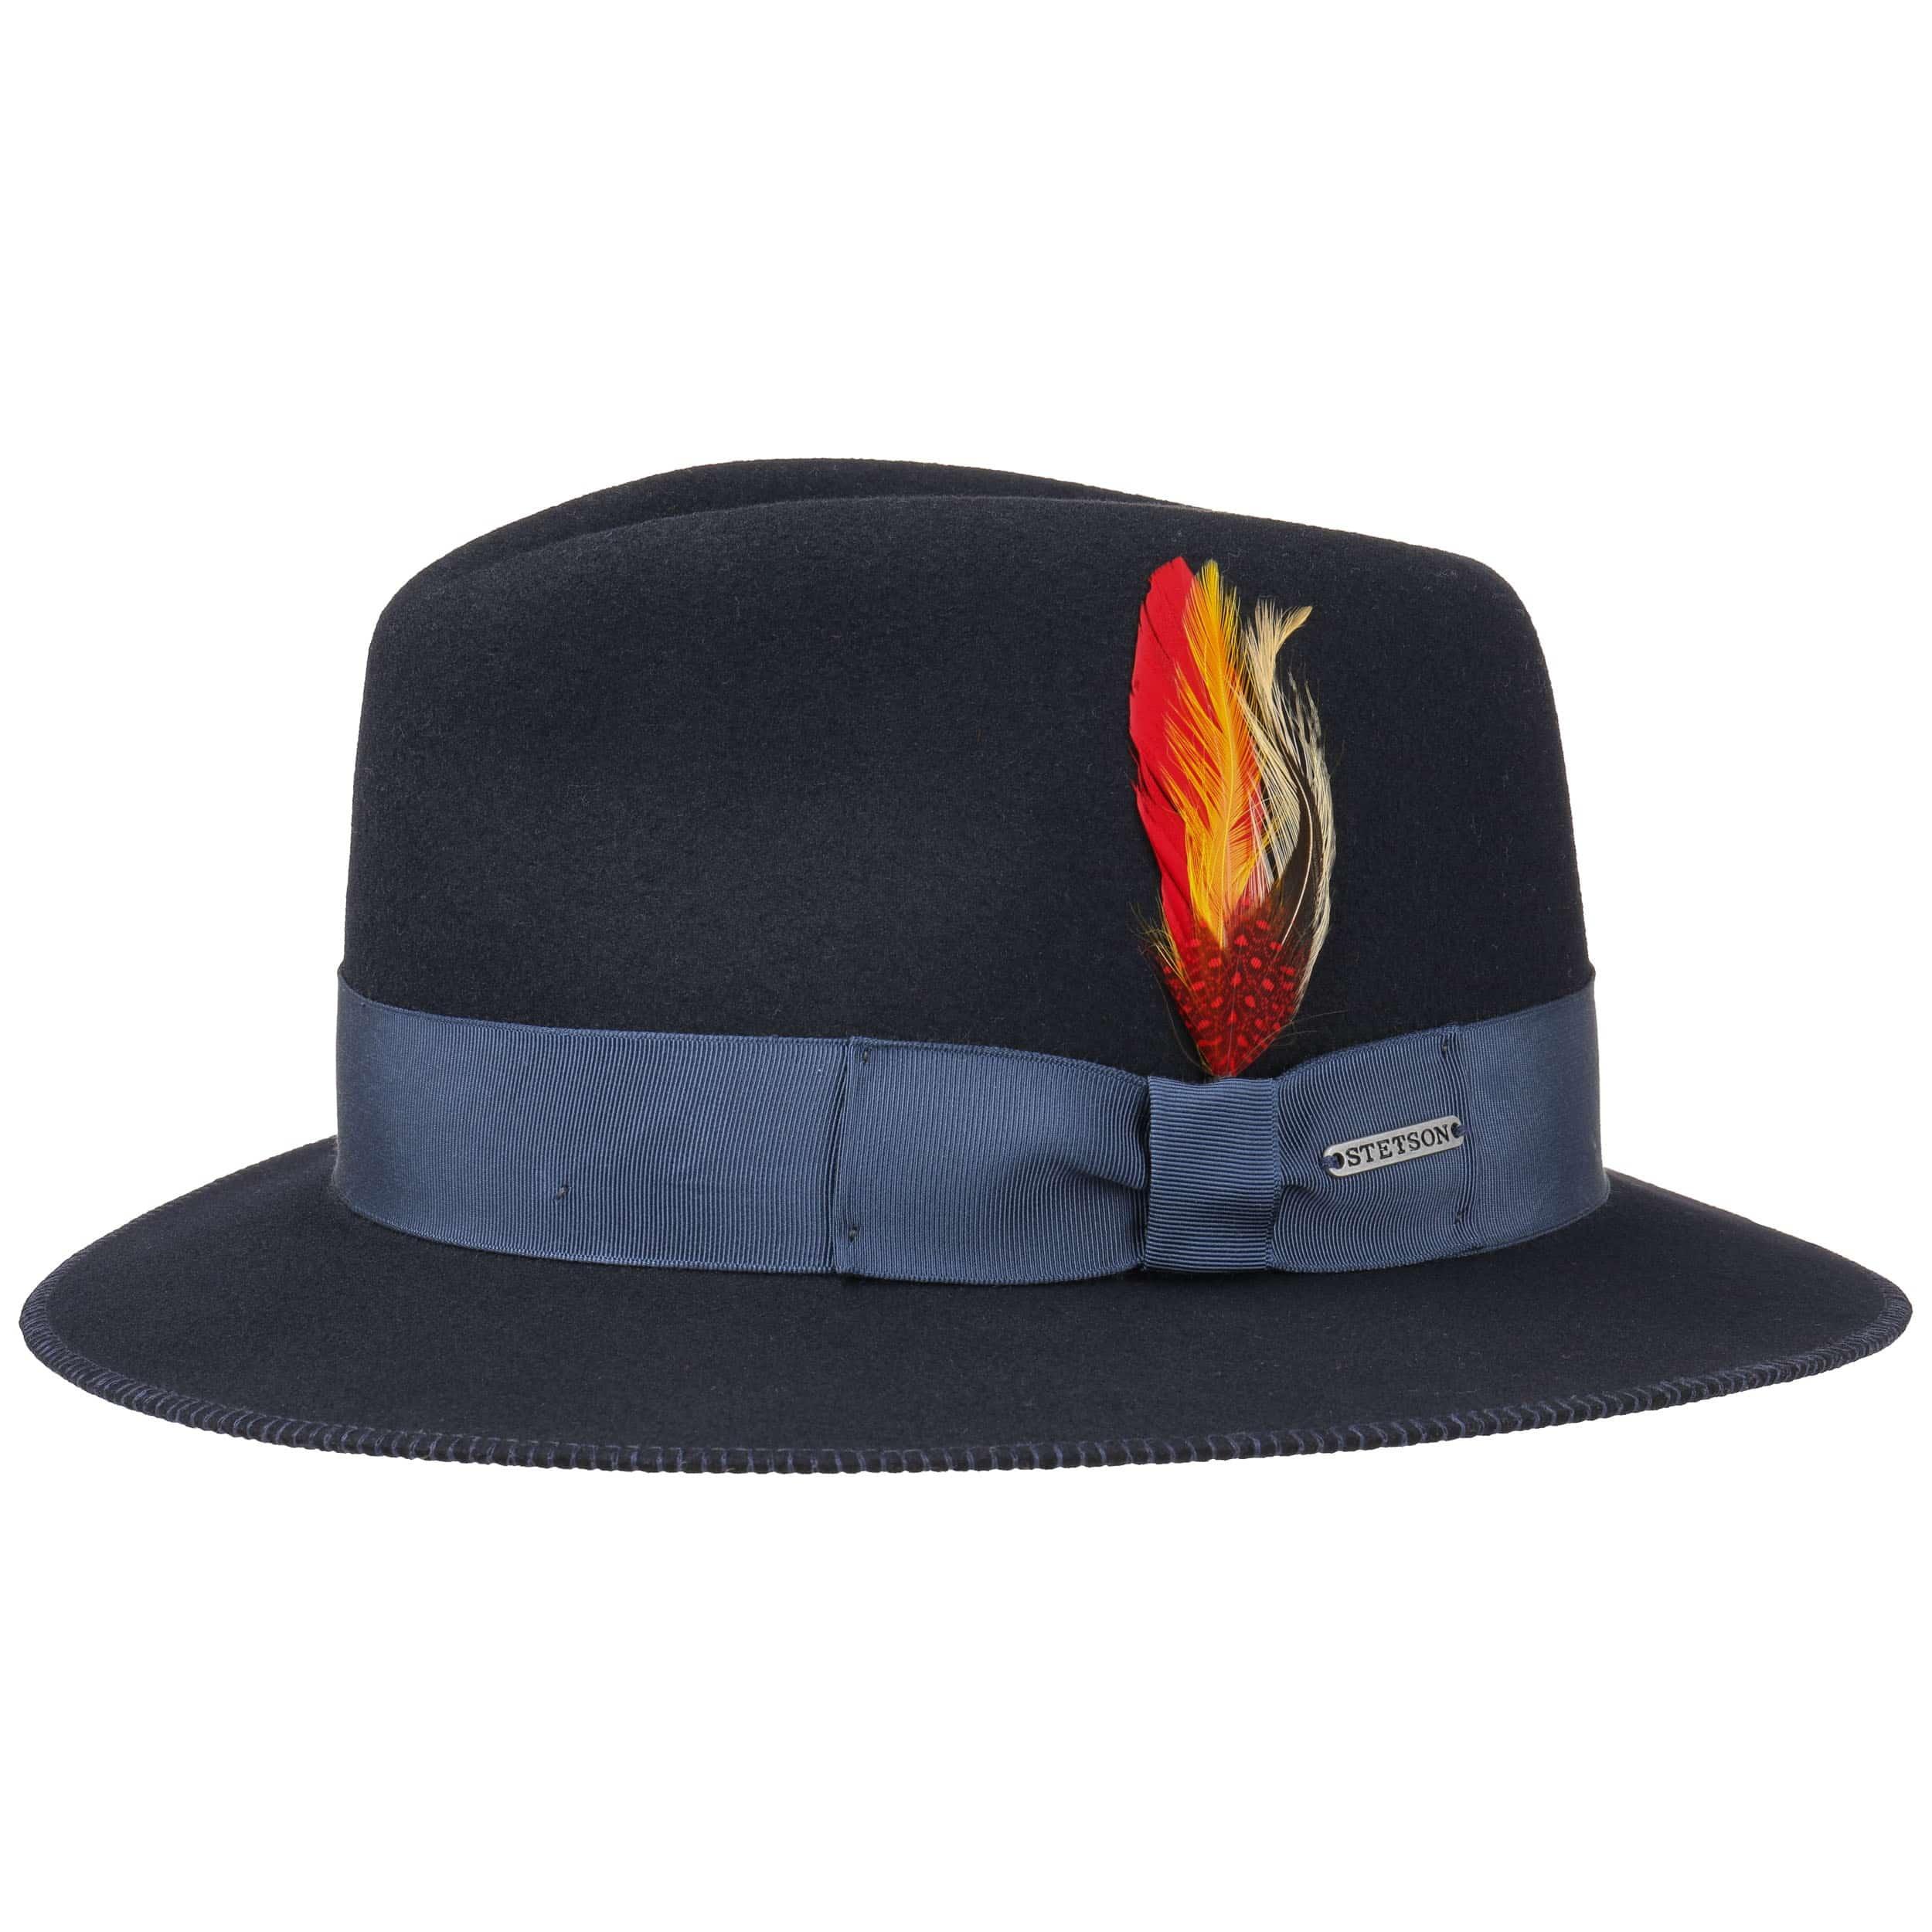 Vienna VitaFelt Traveller Hat by Stetson Rain hats Stetson WrkFhXiXj